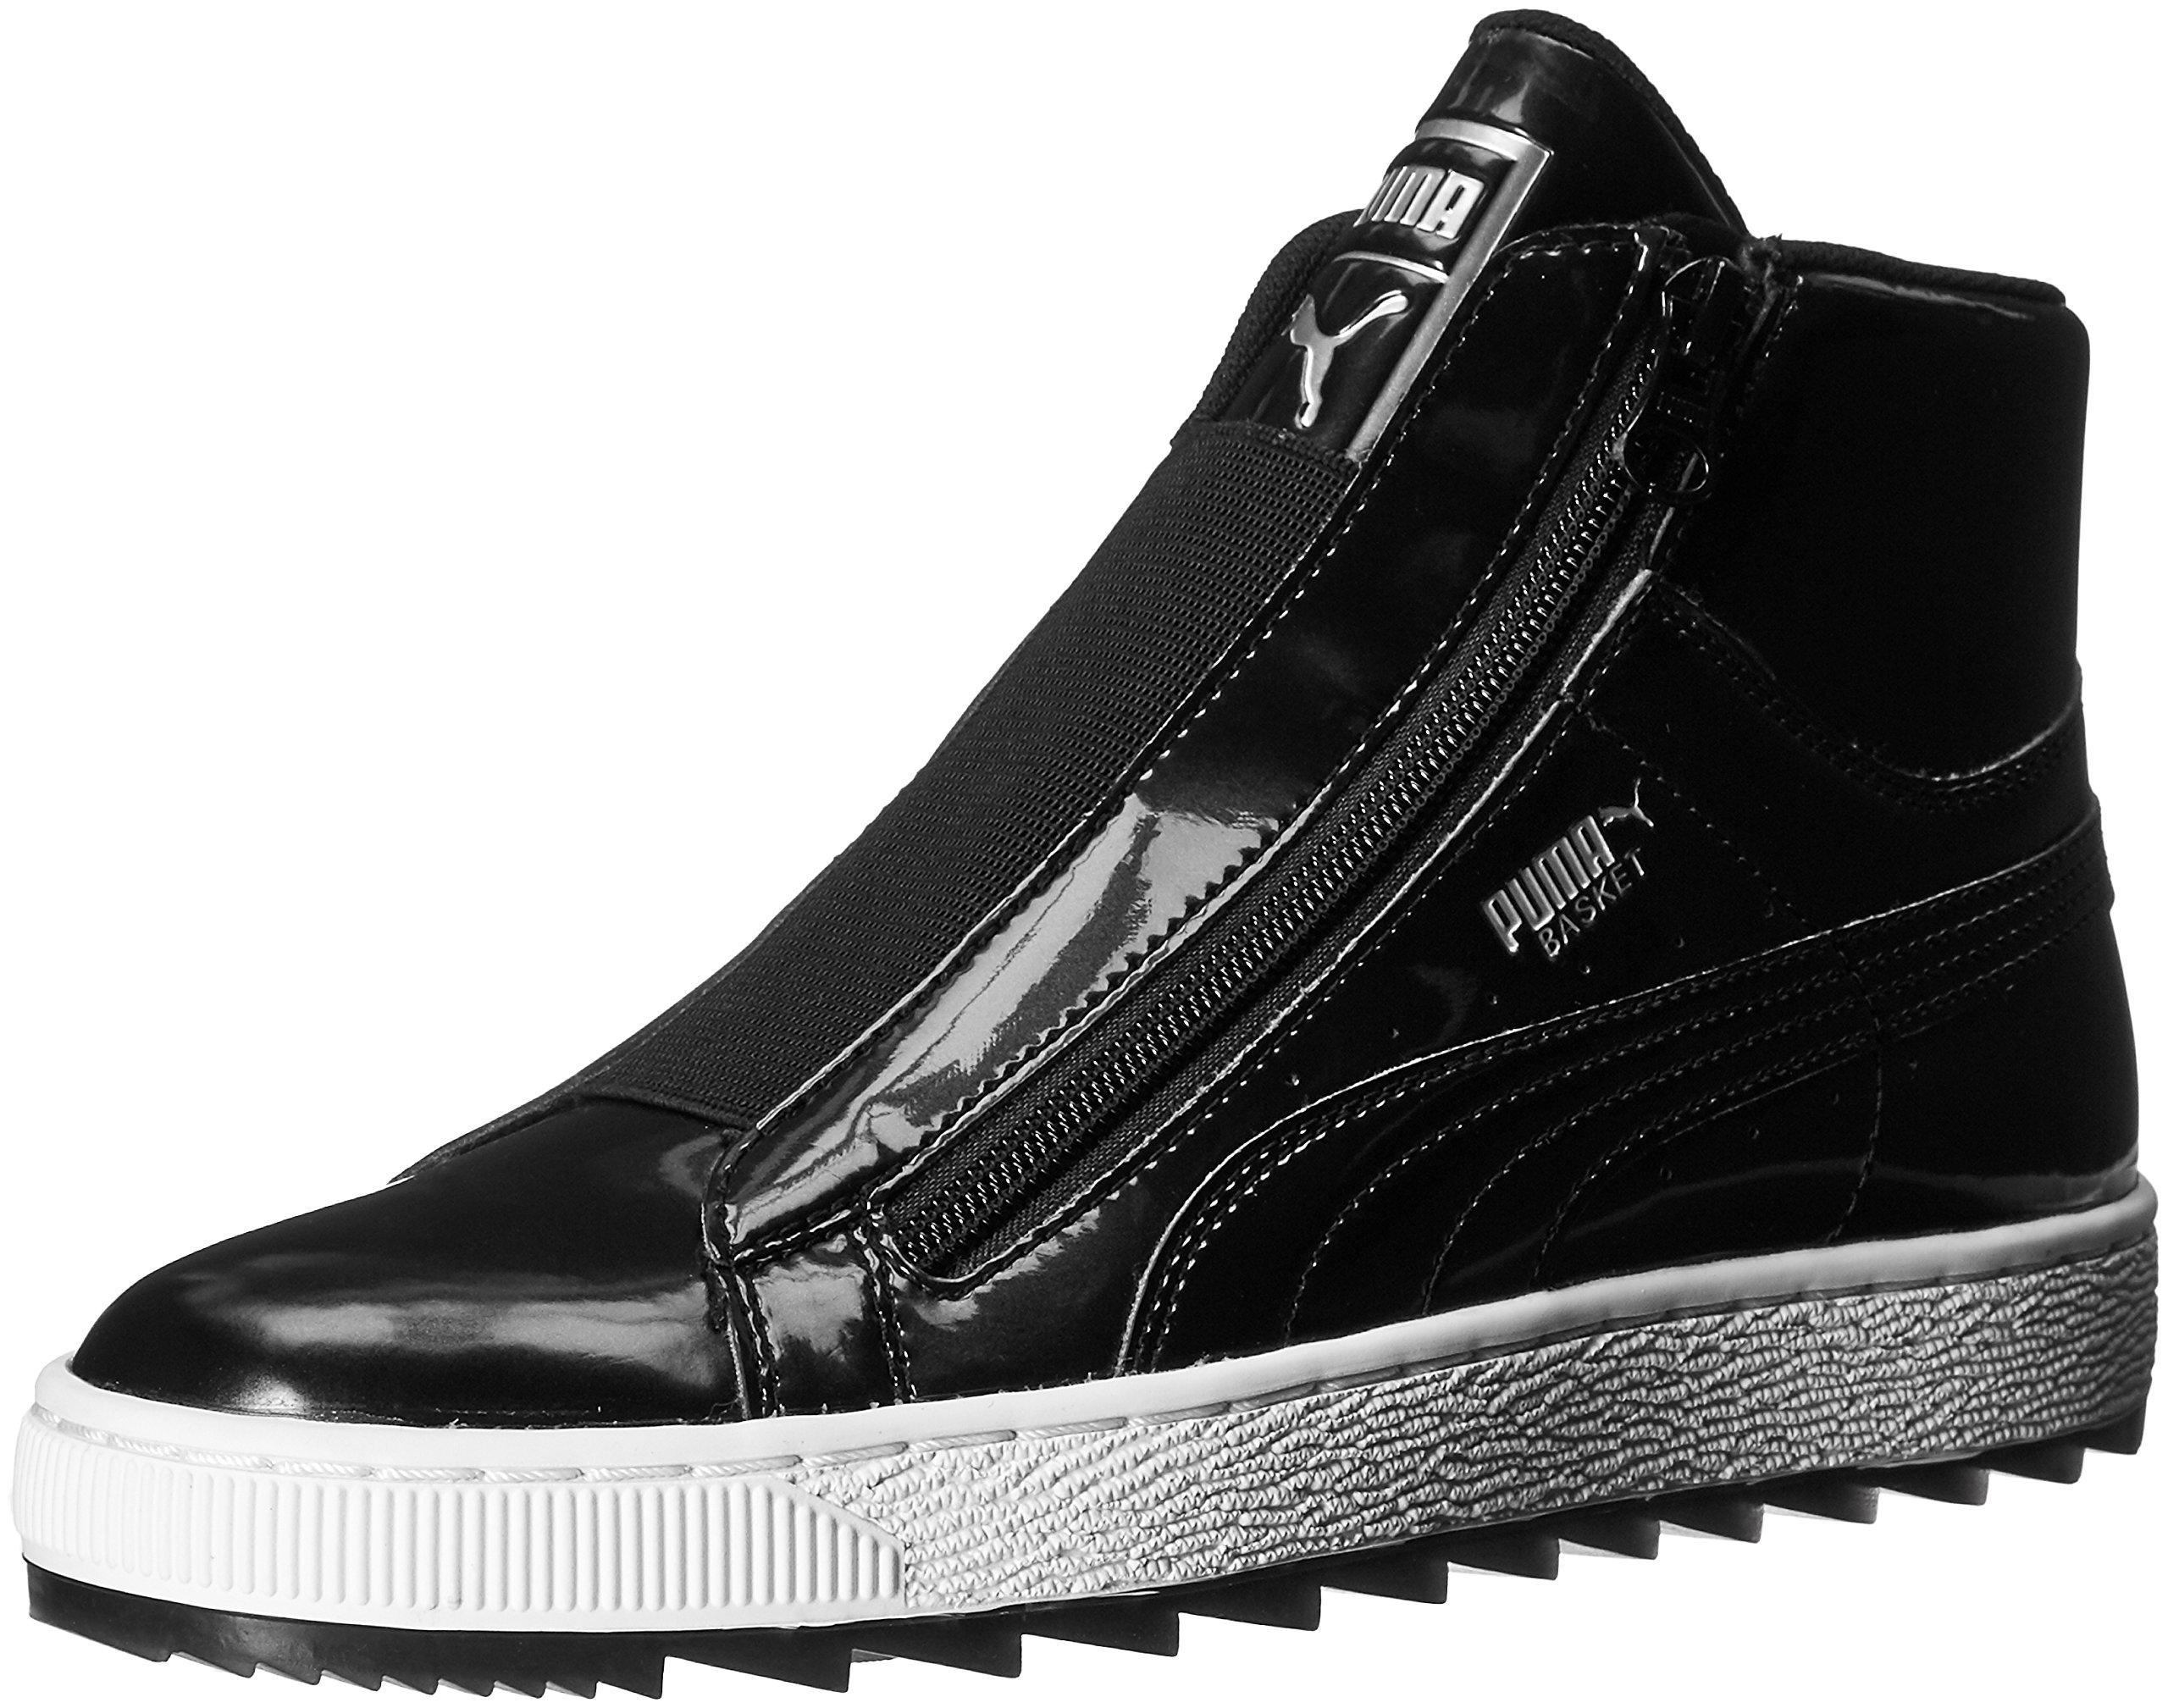 PUMA Women's Basket mid WTR WN's Fashion Sneaker, Black, 7 M US